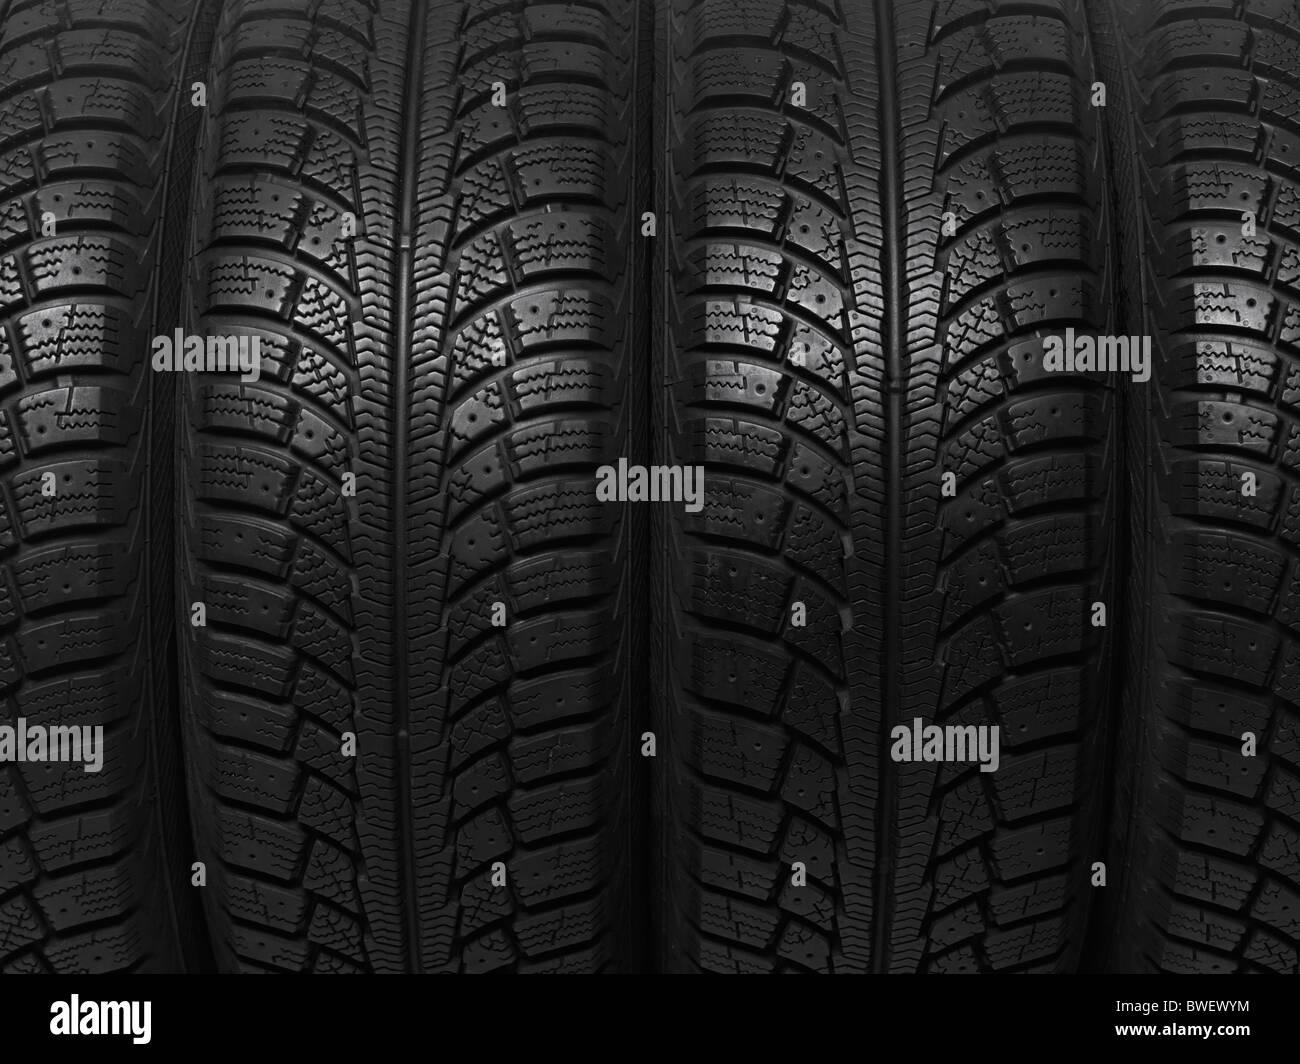 Primer plano de un coche neumáticos de invierno textura de fondo Imagen De Stock